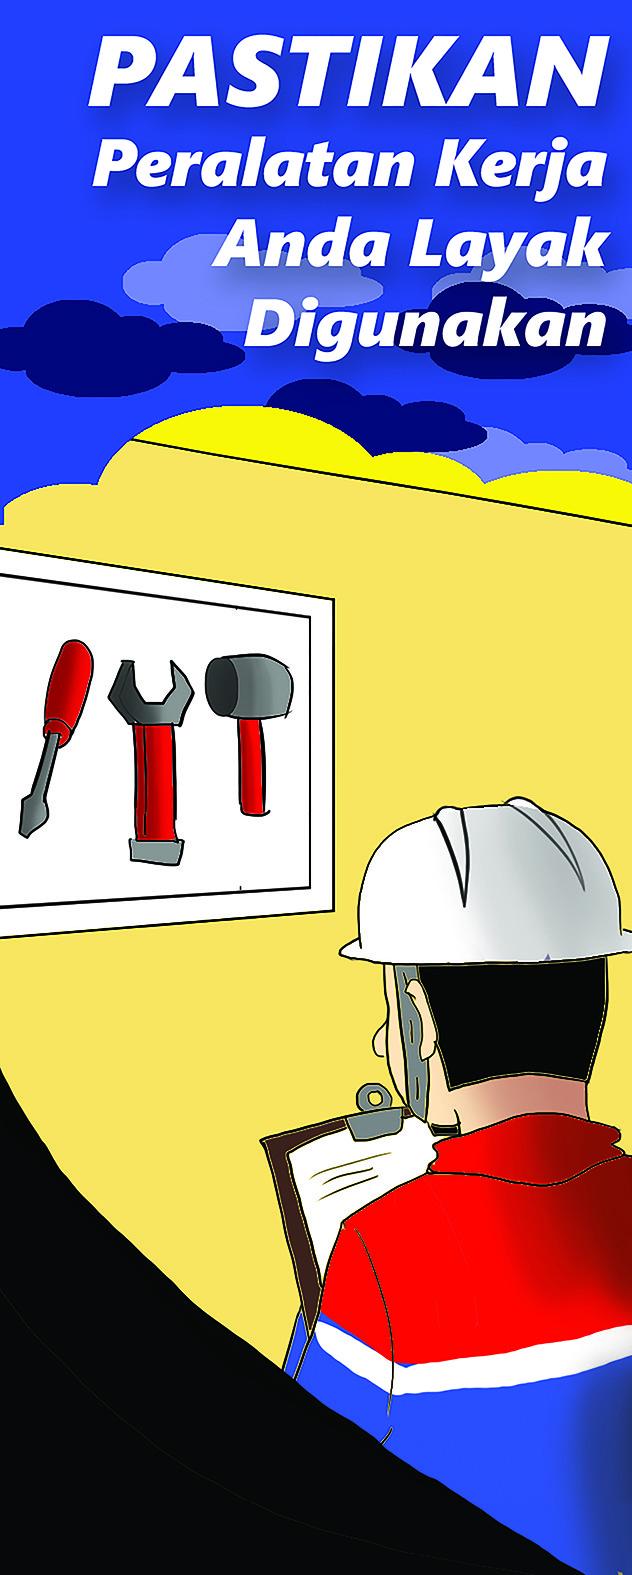 Putra wira adhiprajna pertamina peralatan layak guna